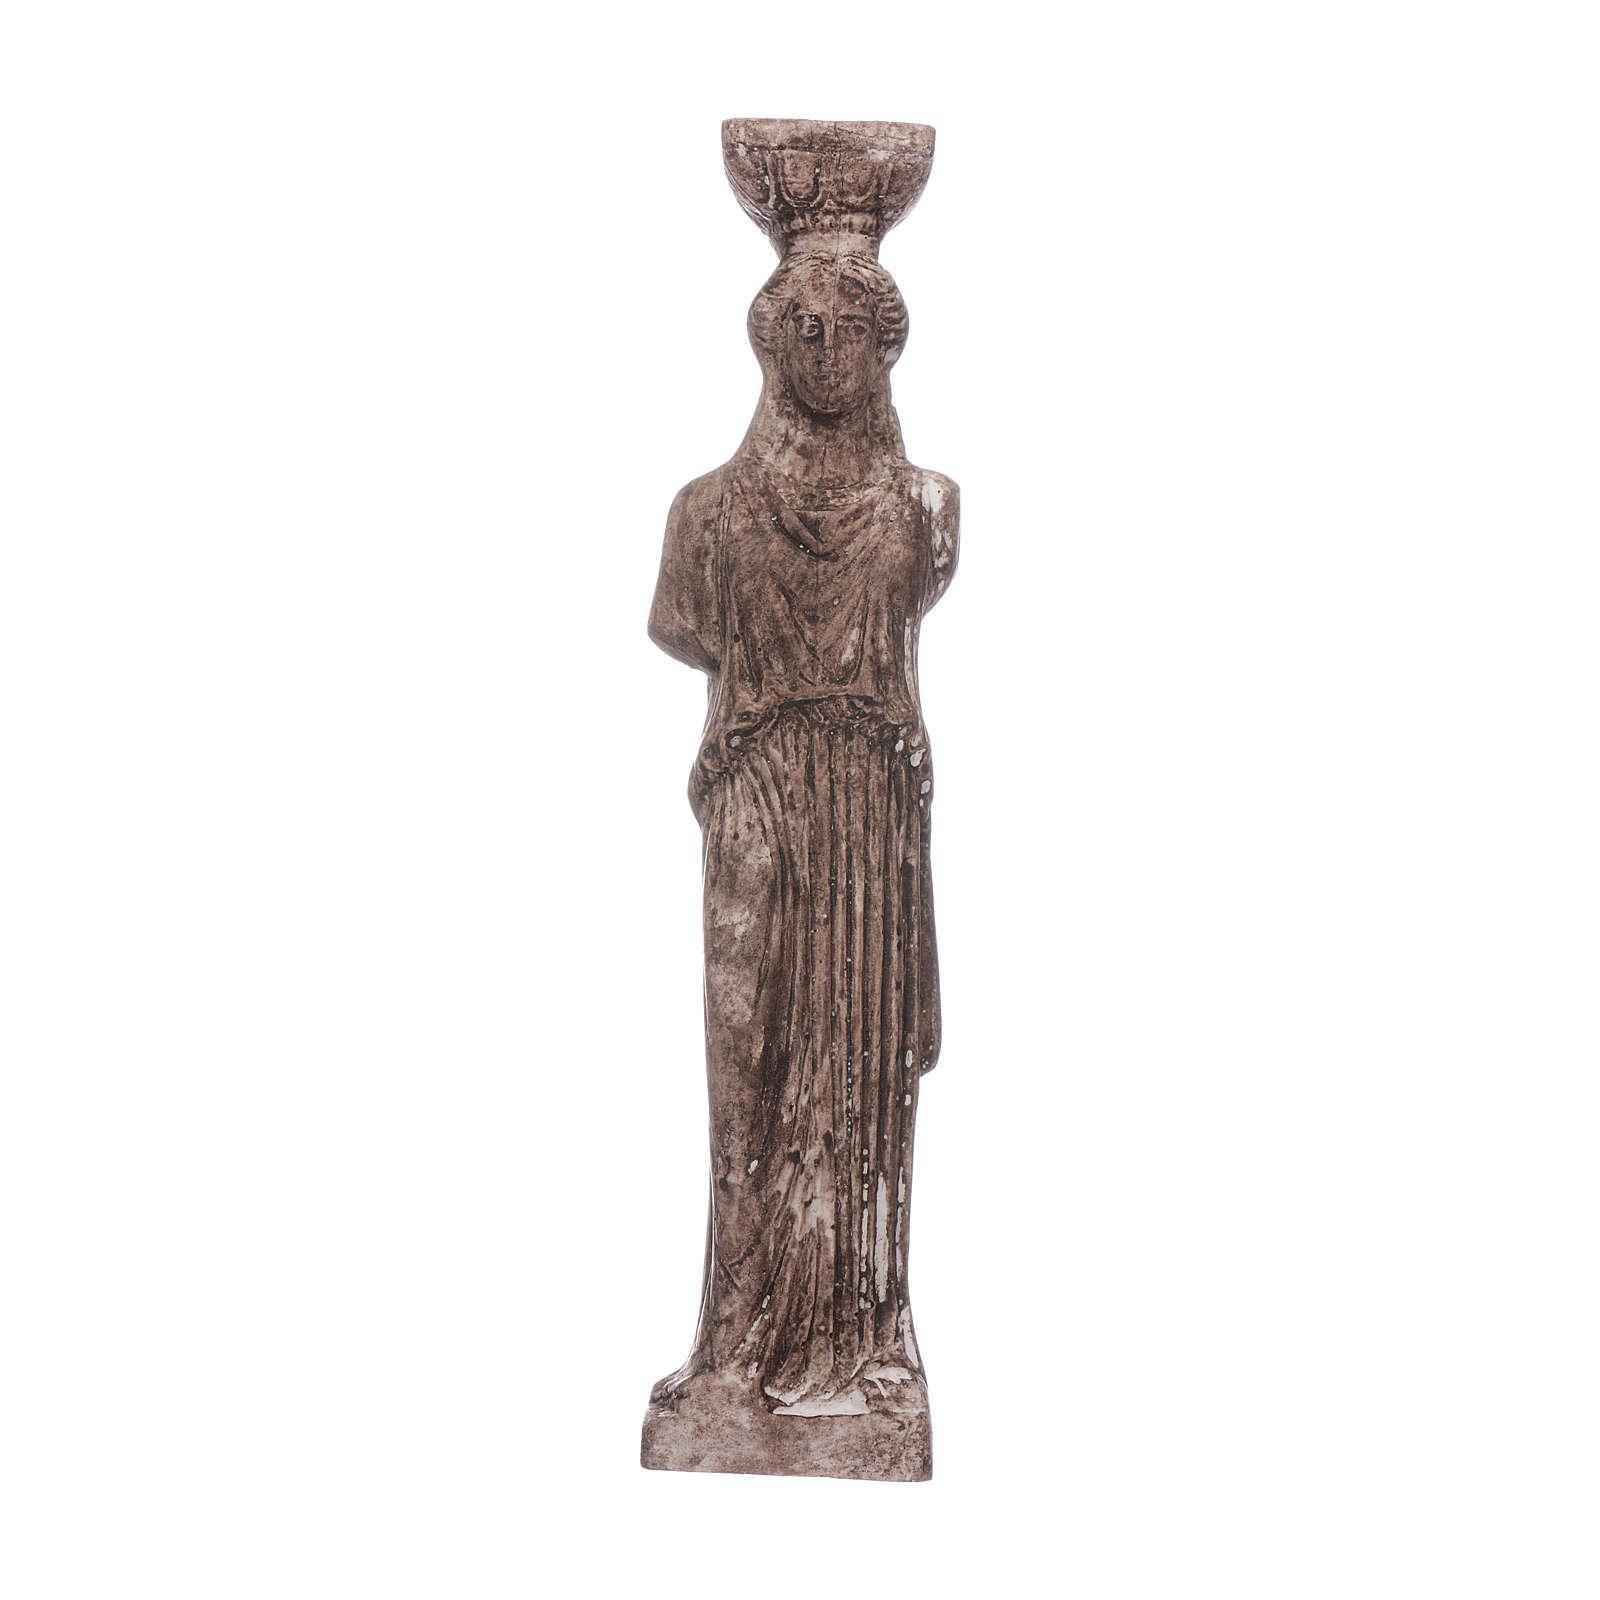 Diosa griega de resina 15 cm 4